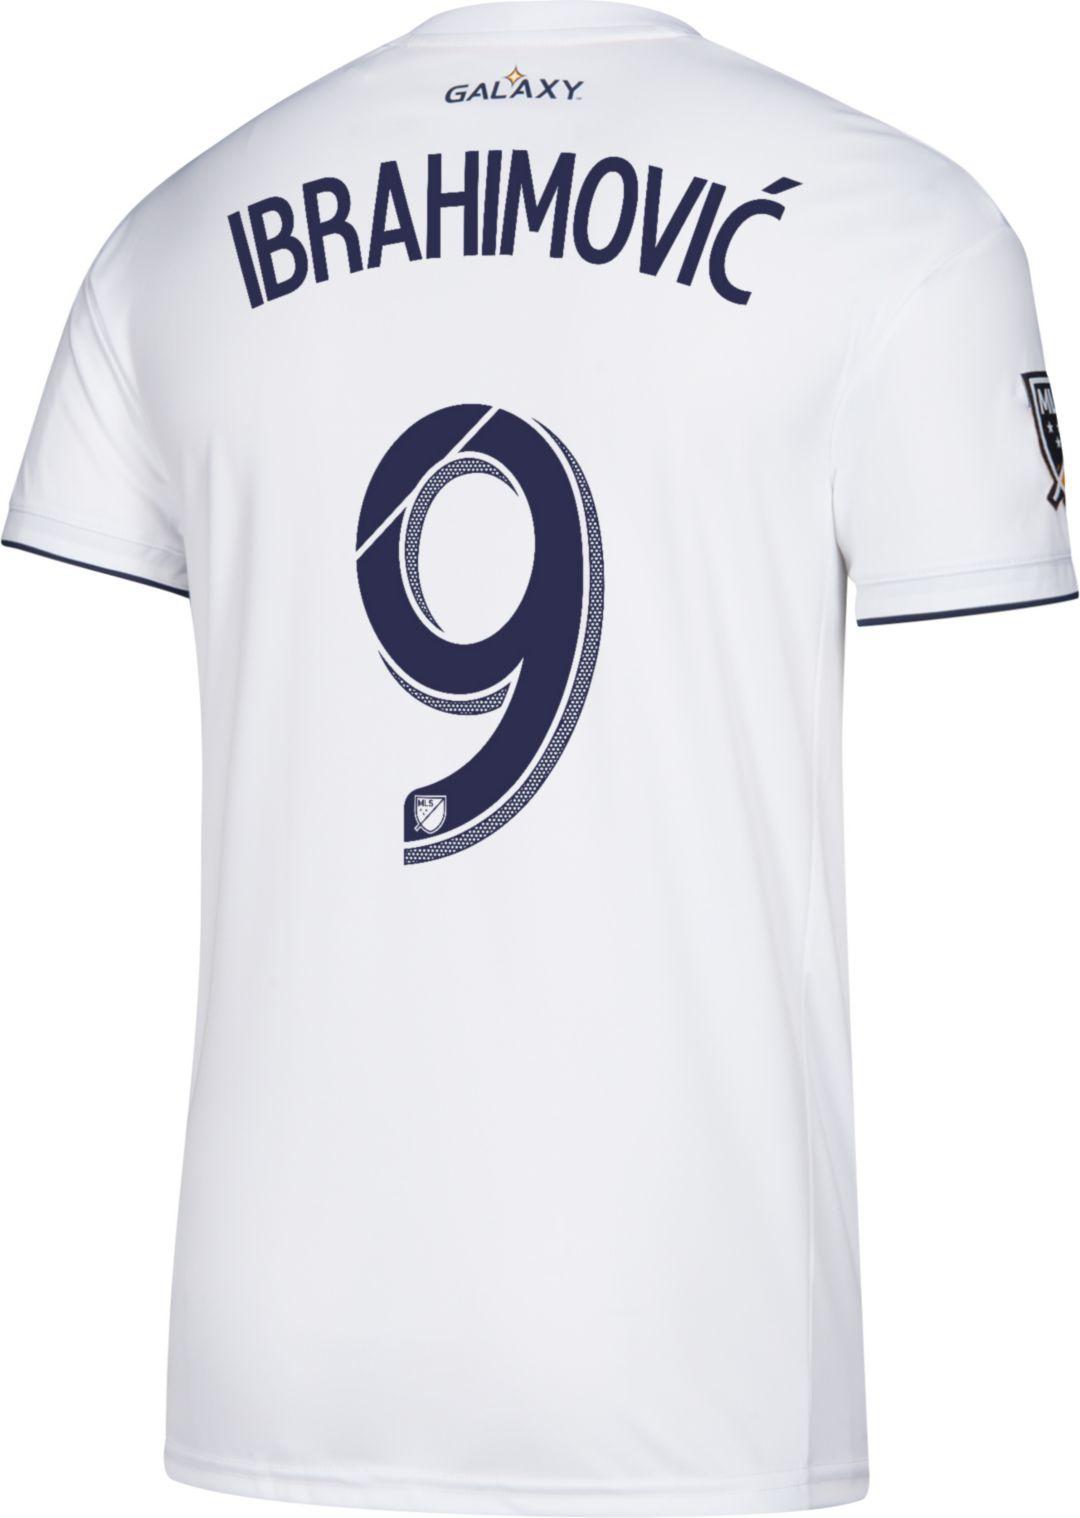 d72138ca84f adidas Men s Los Angeles Galaxy Zlatan Ibrahimovic  9 Primary Replica Jersey  3